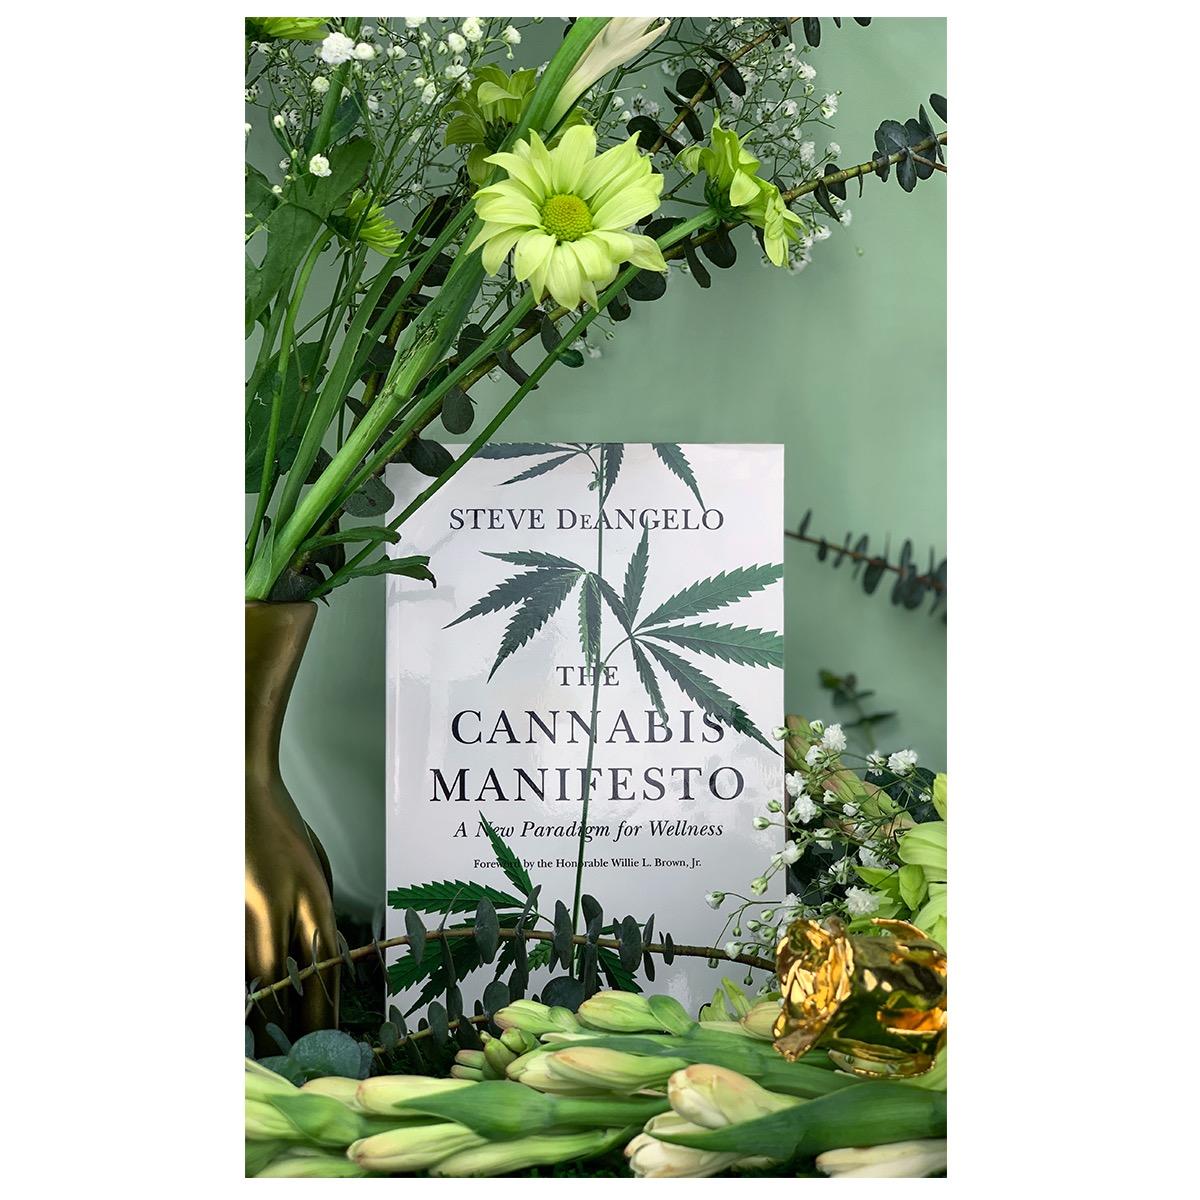 032_Cannabis_Manifesto.jpg